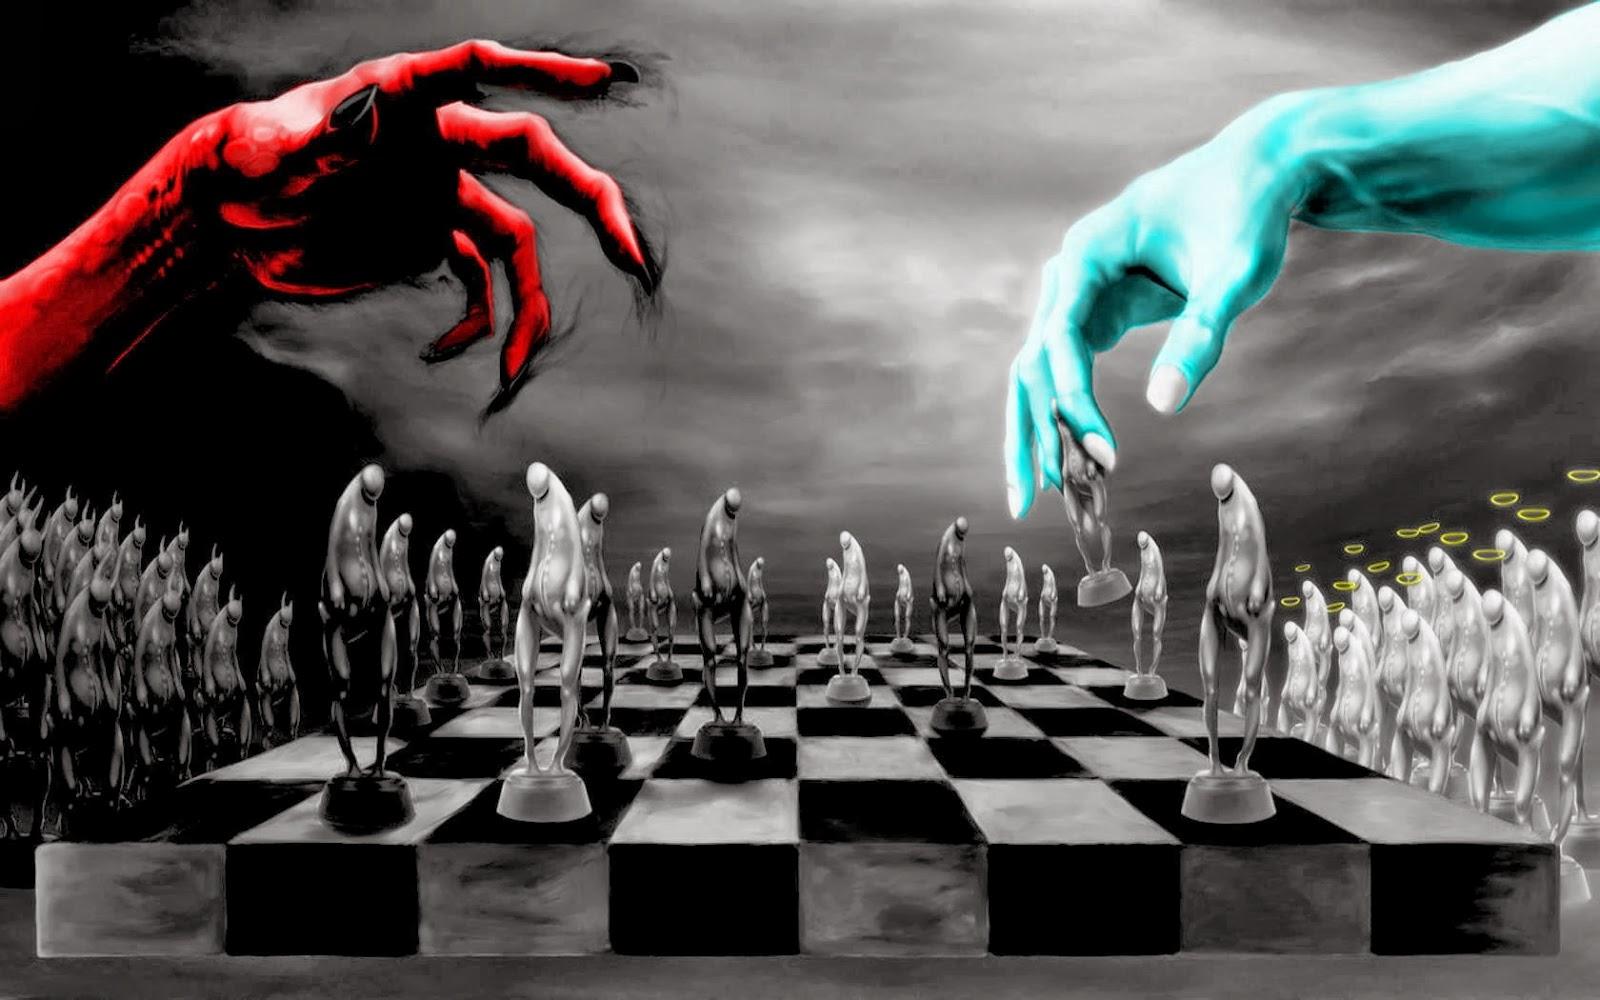 3D Chess Board Wallpaper - WallpaperSafari